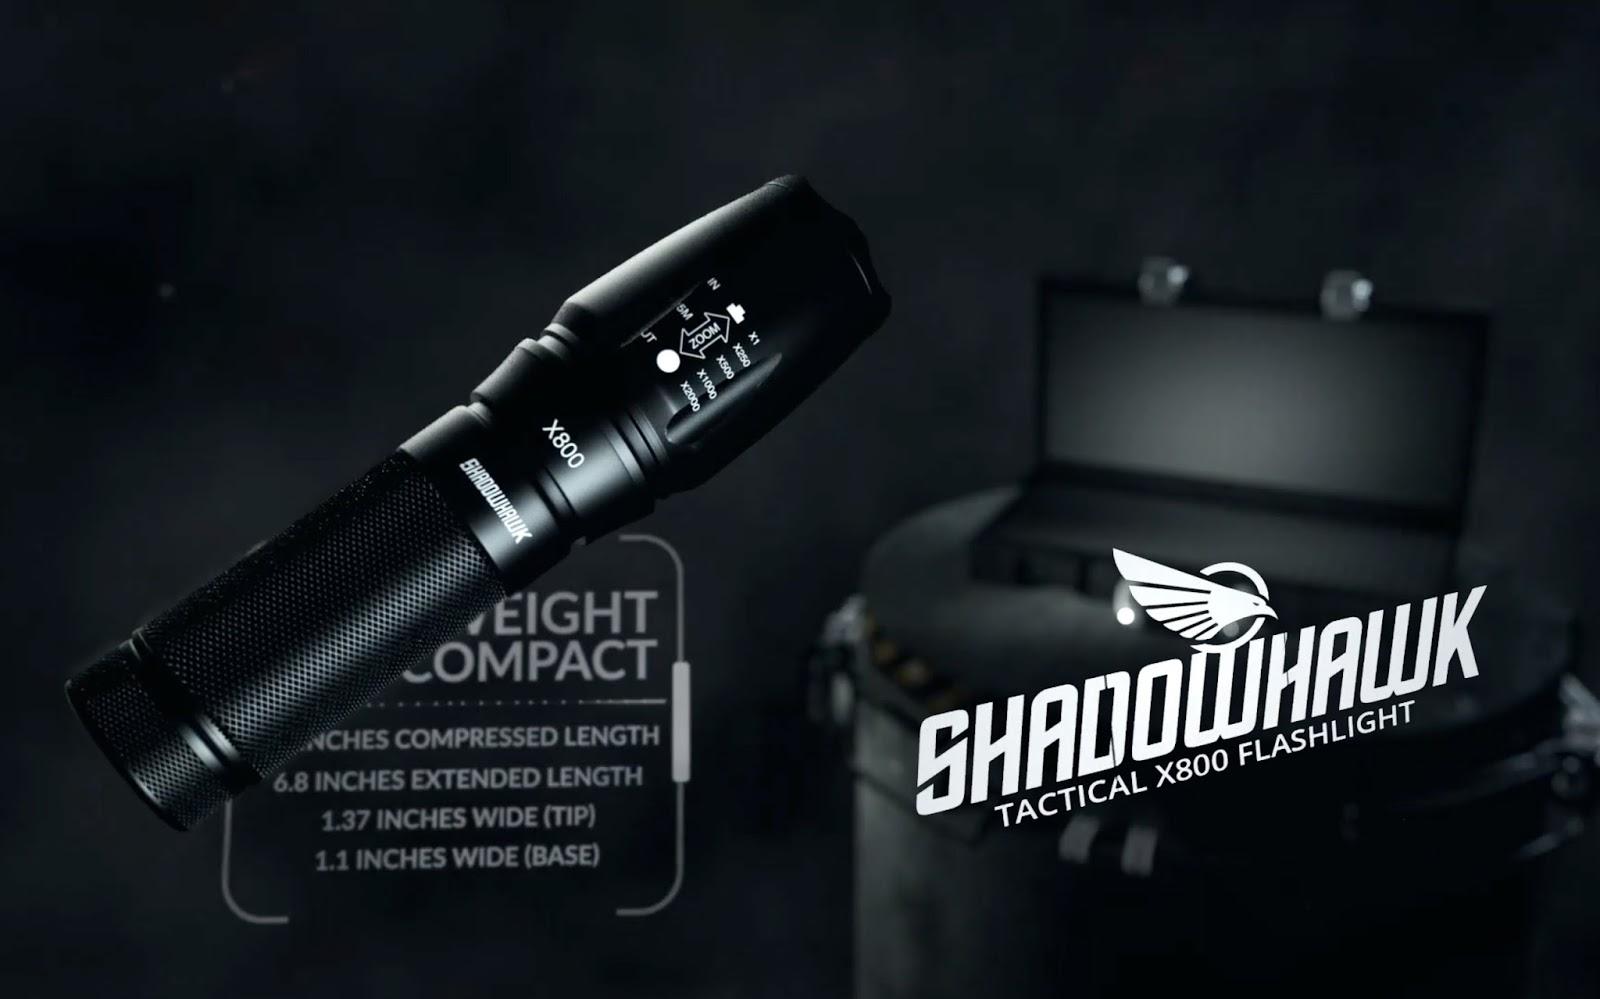 shadowhawk x800 battery charging instructions